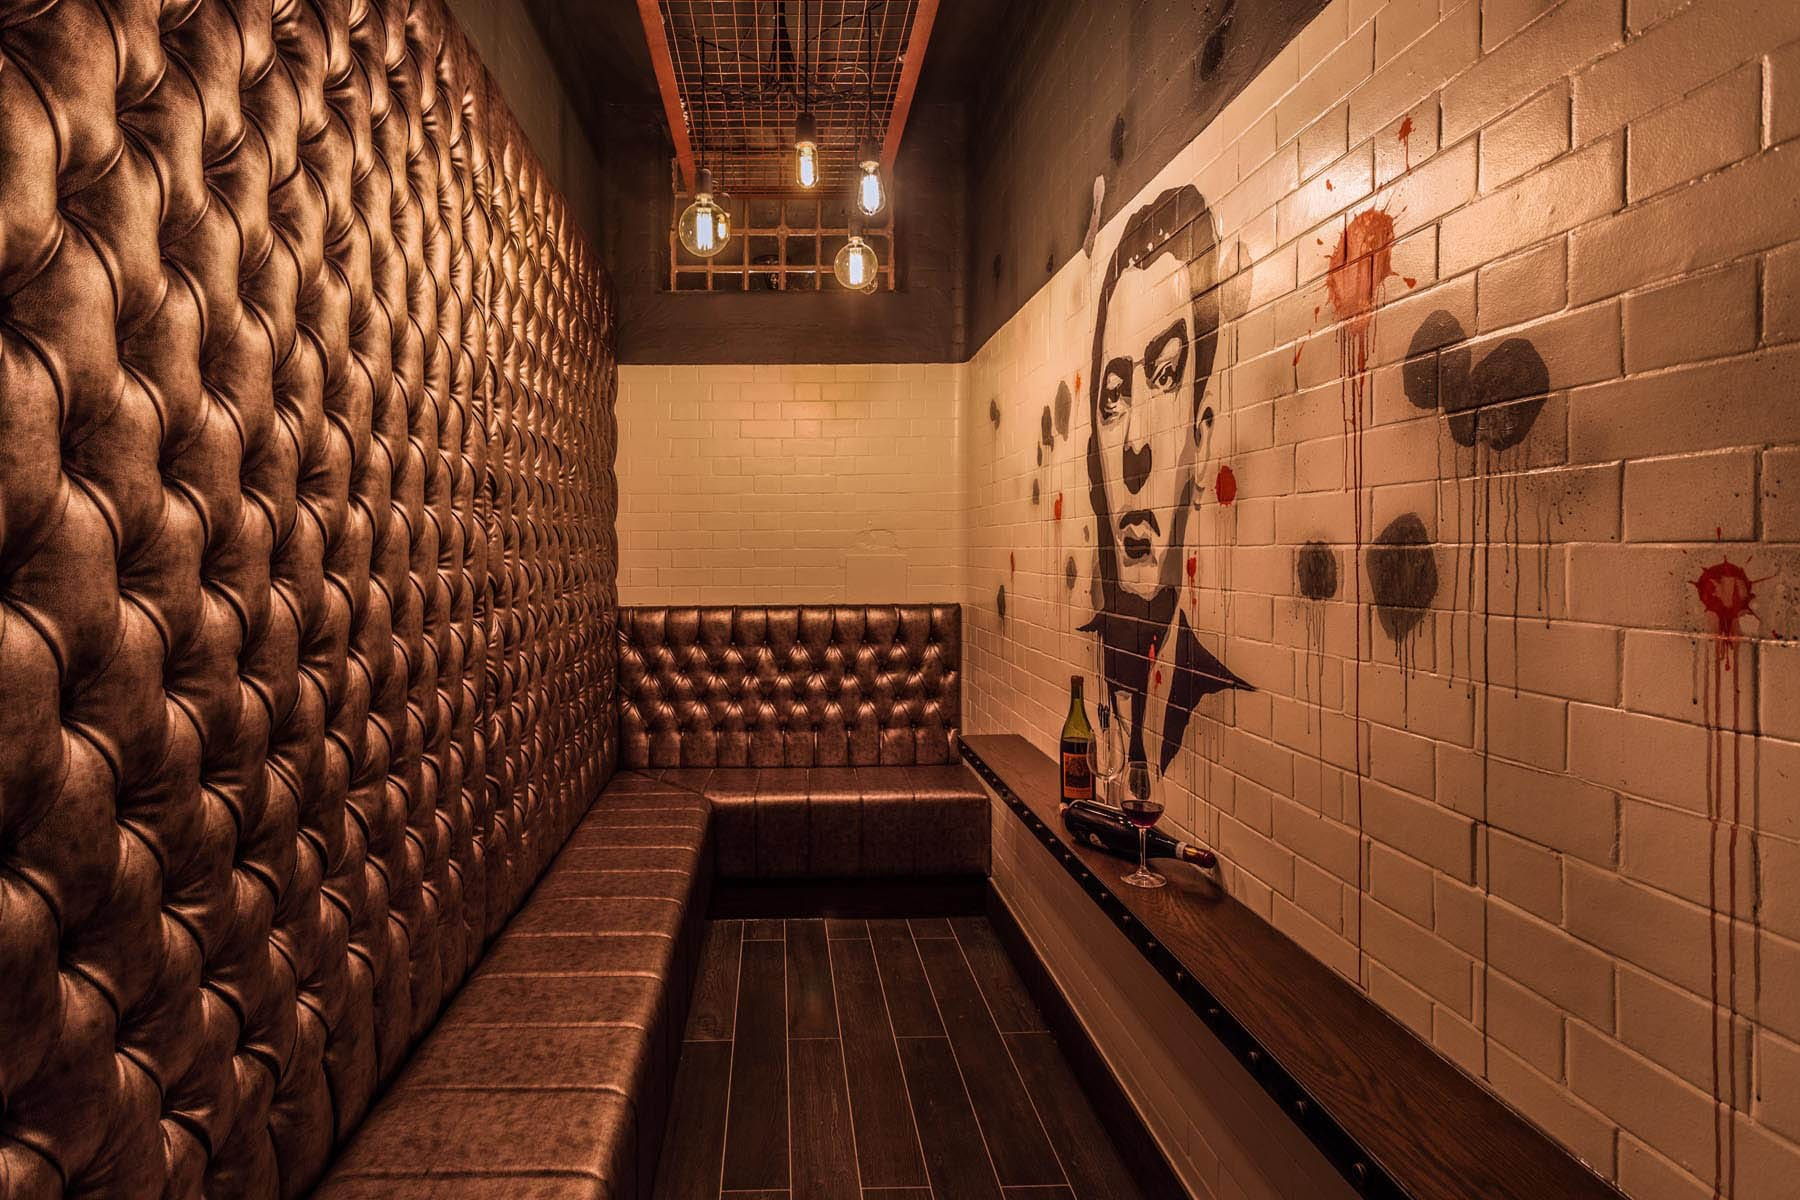 Bar using prison cells